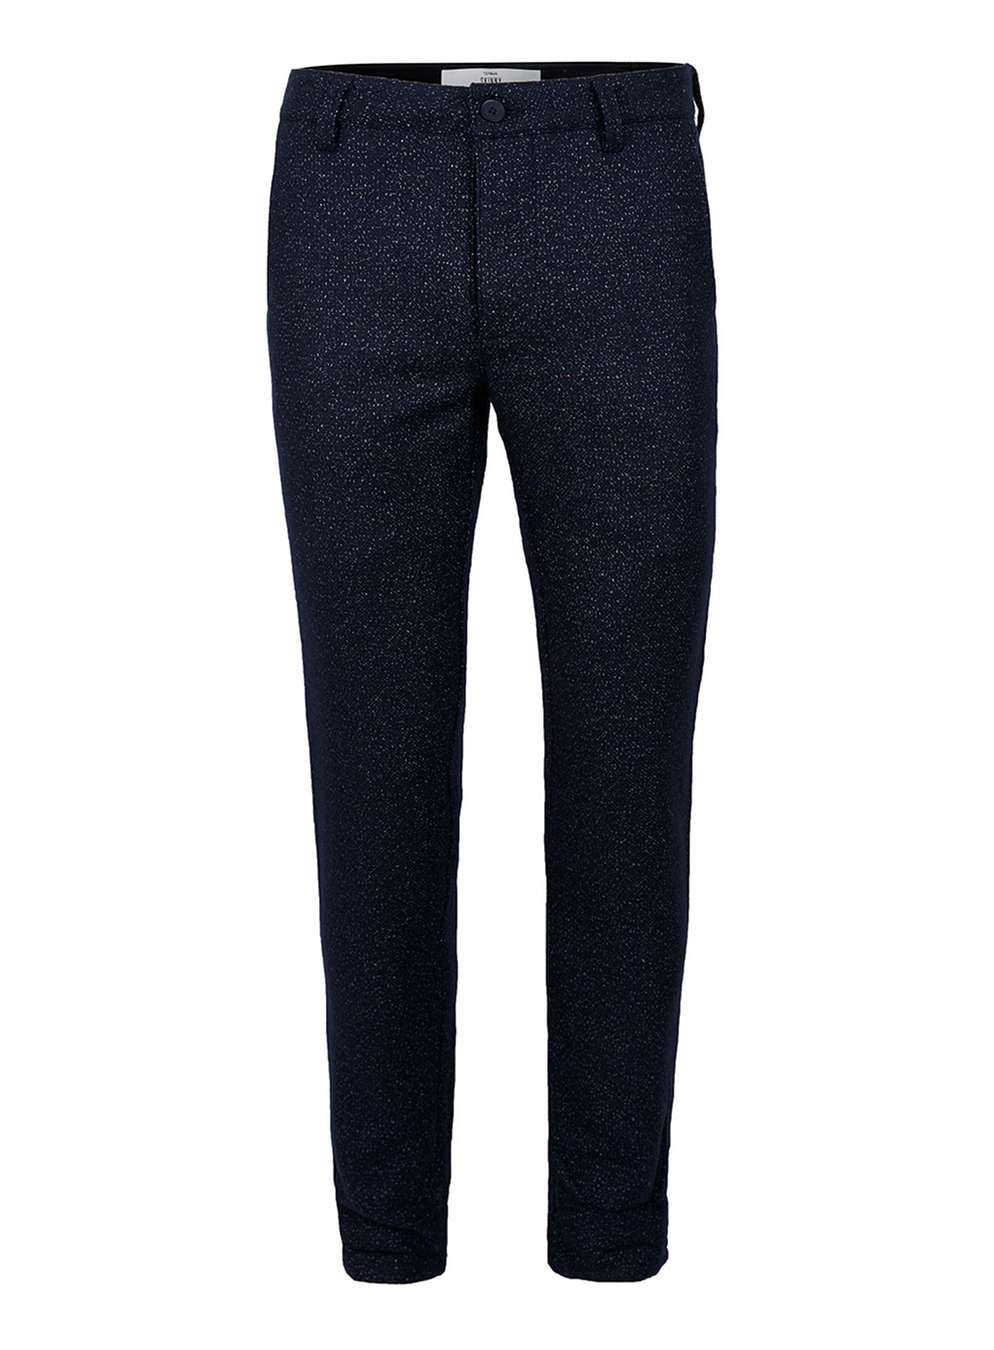 Wool blend skinny chinos, £35 ( topman.com )